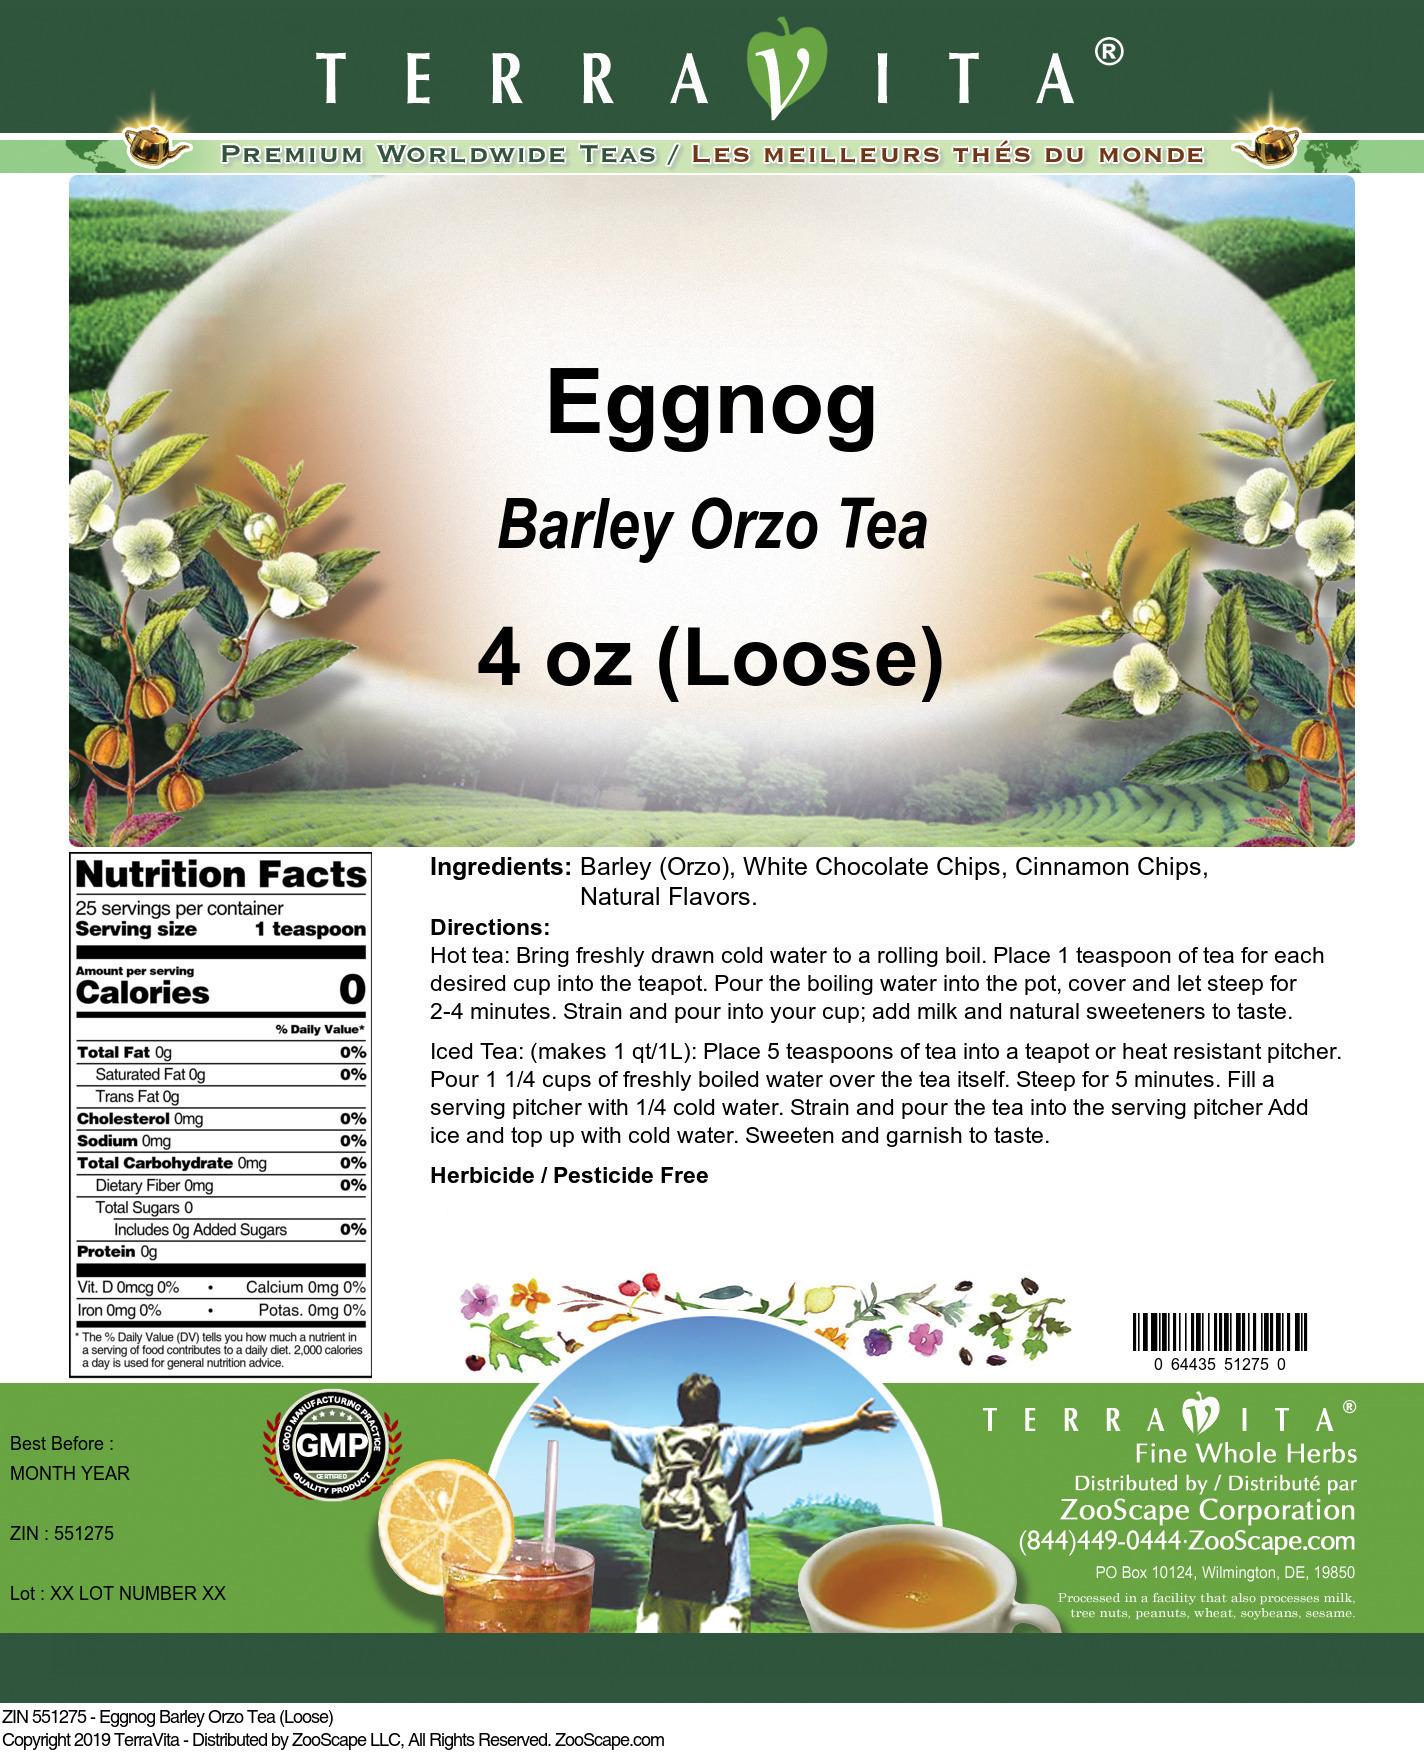 Eggnog Barley Orzo